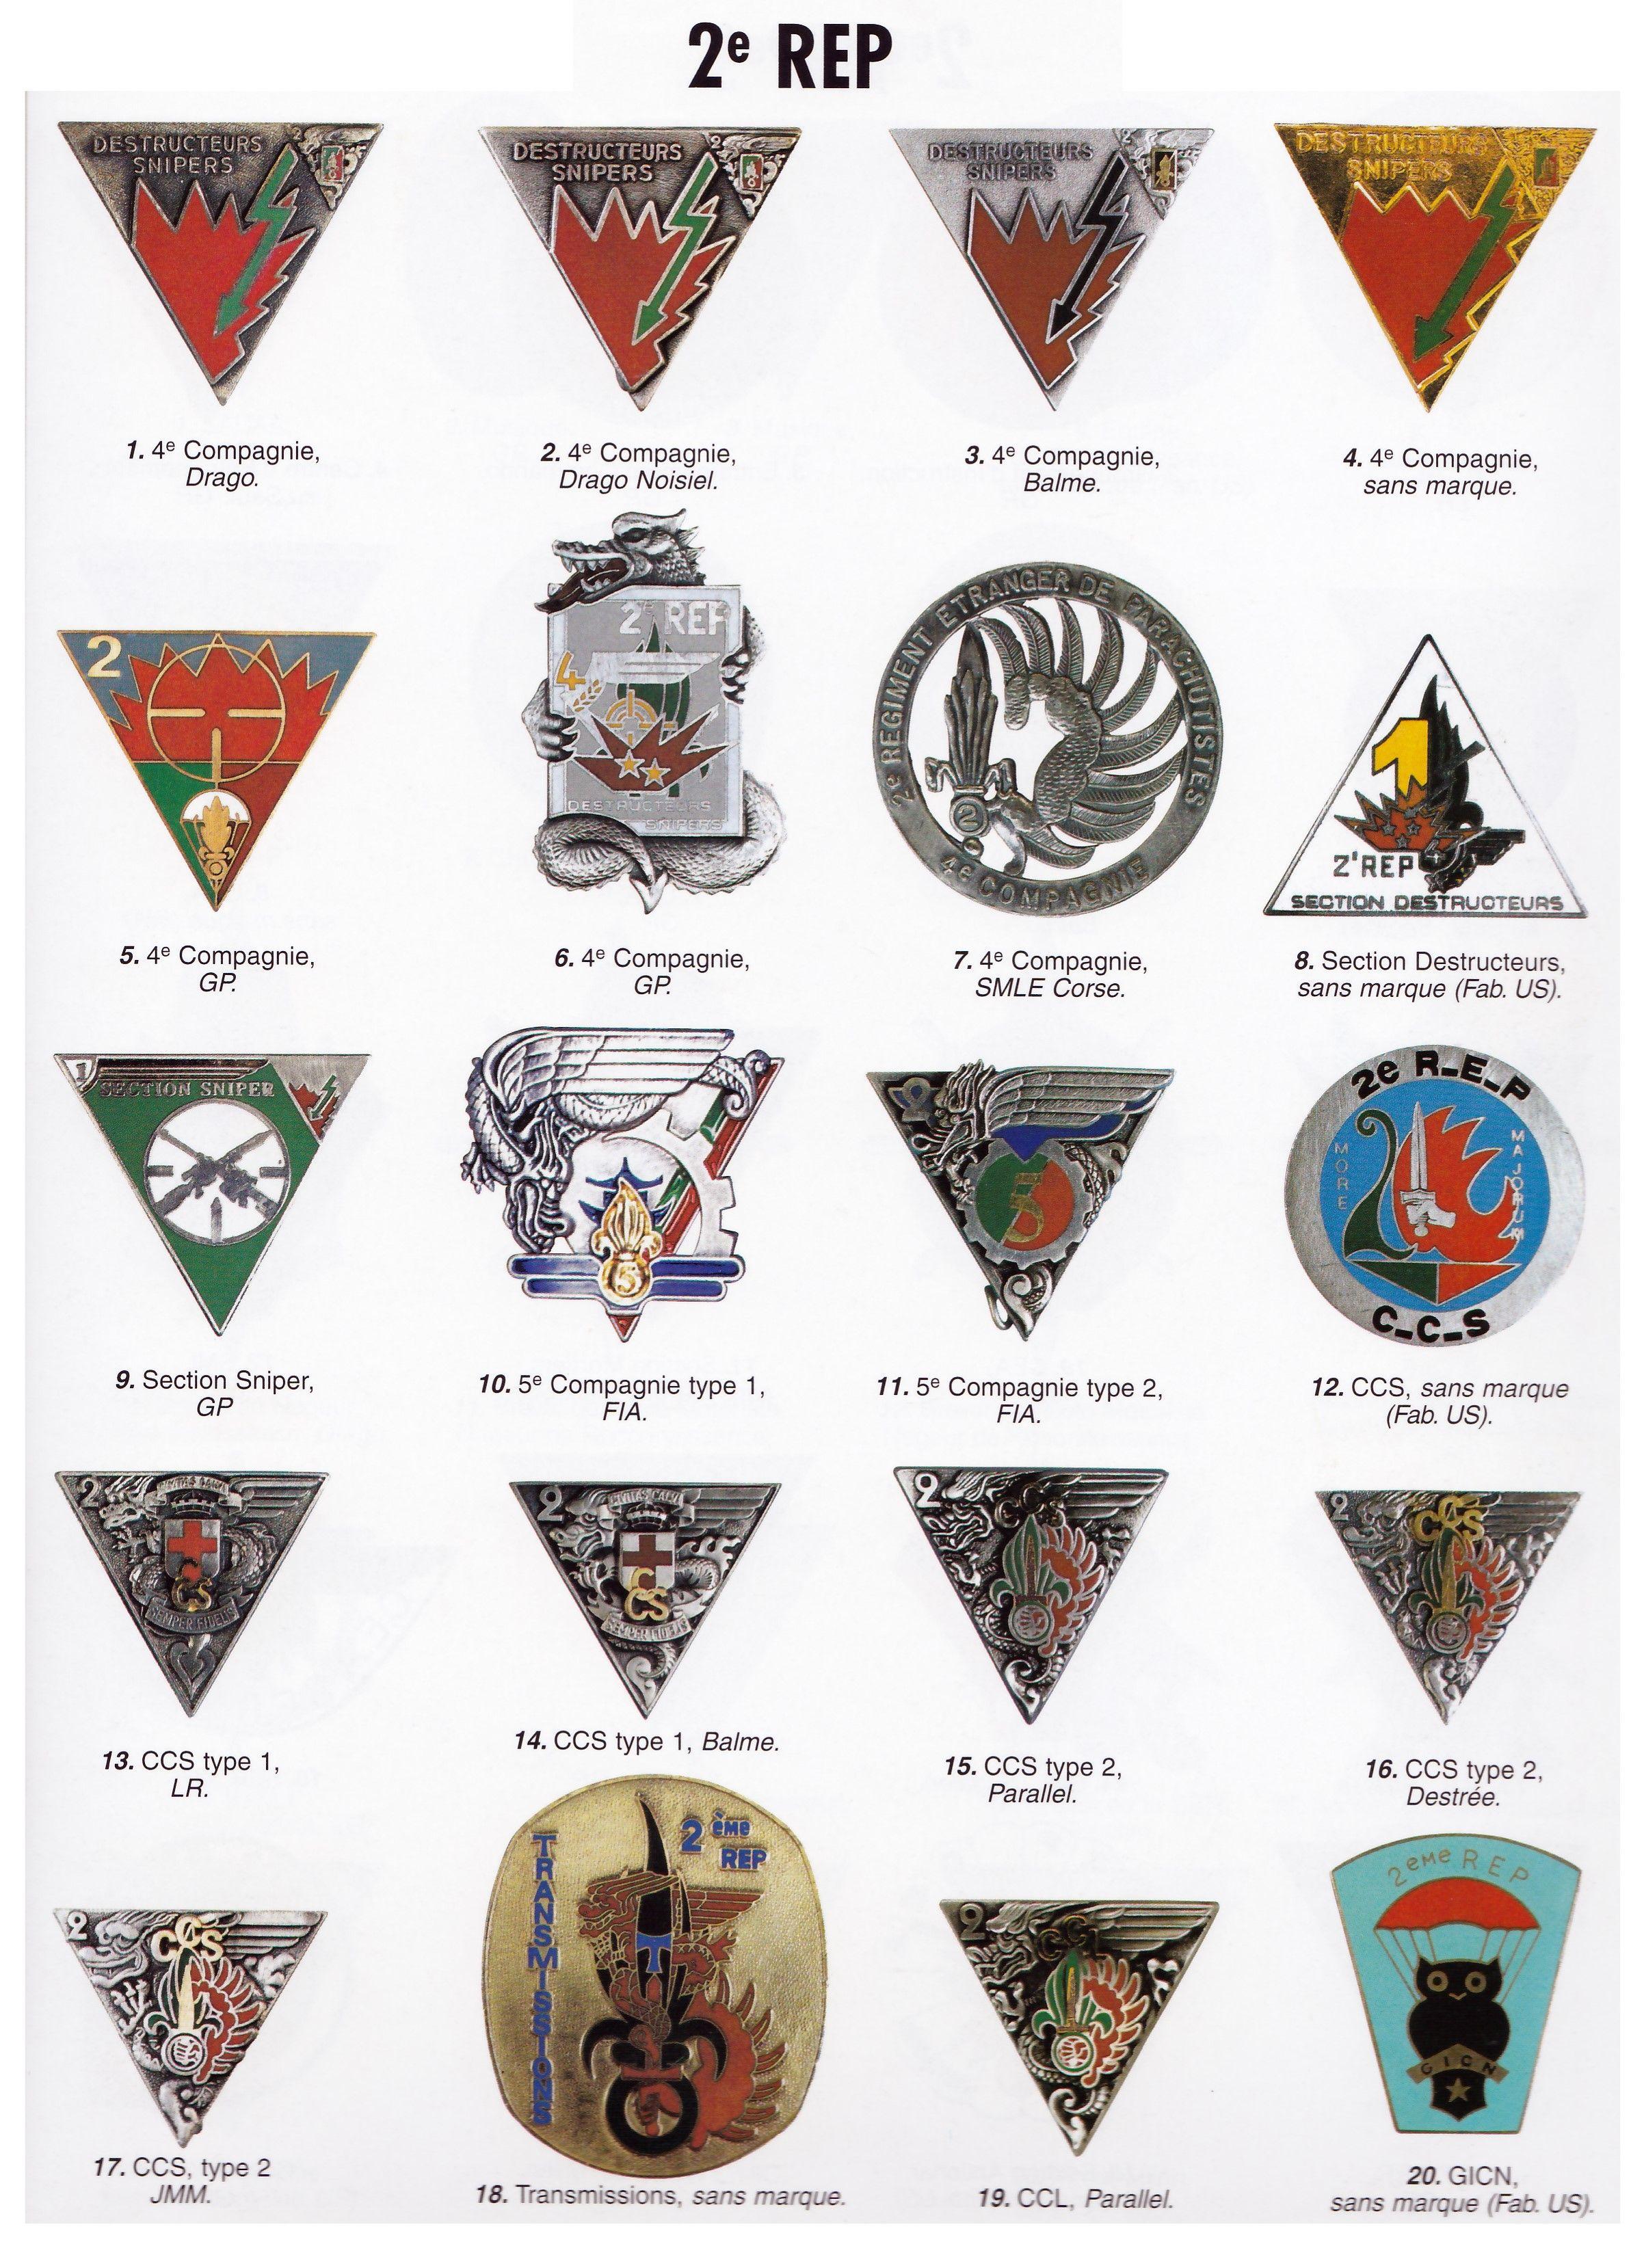 Insignes 2e Rep Legion Etrangere La Legion Etrangere Insignes